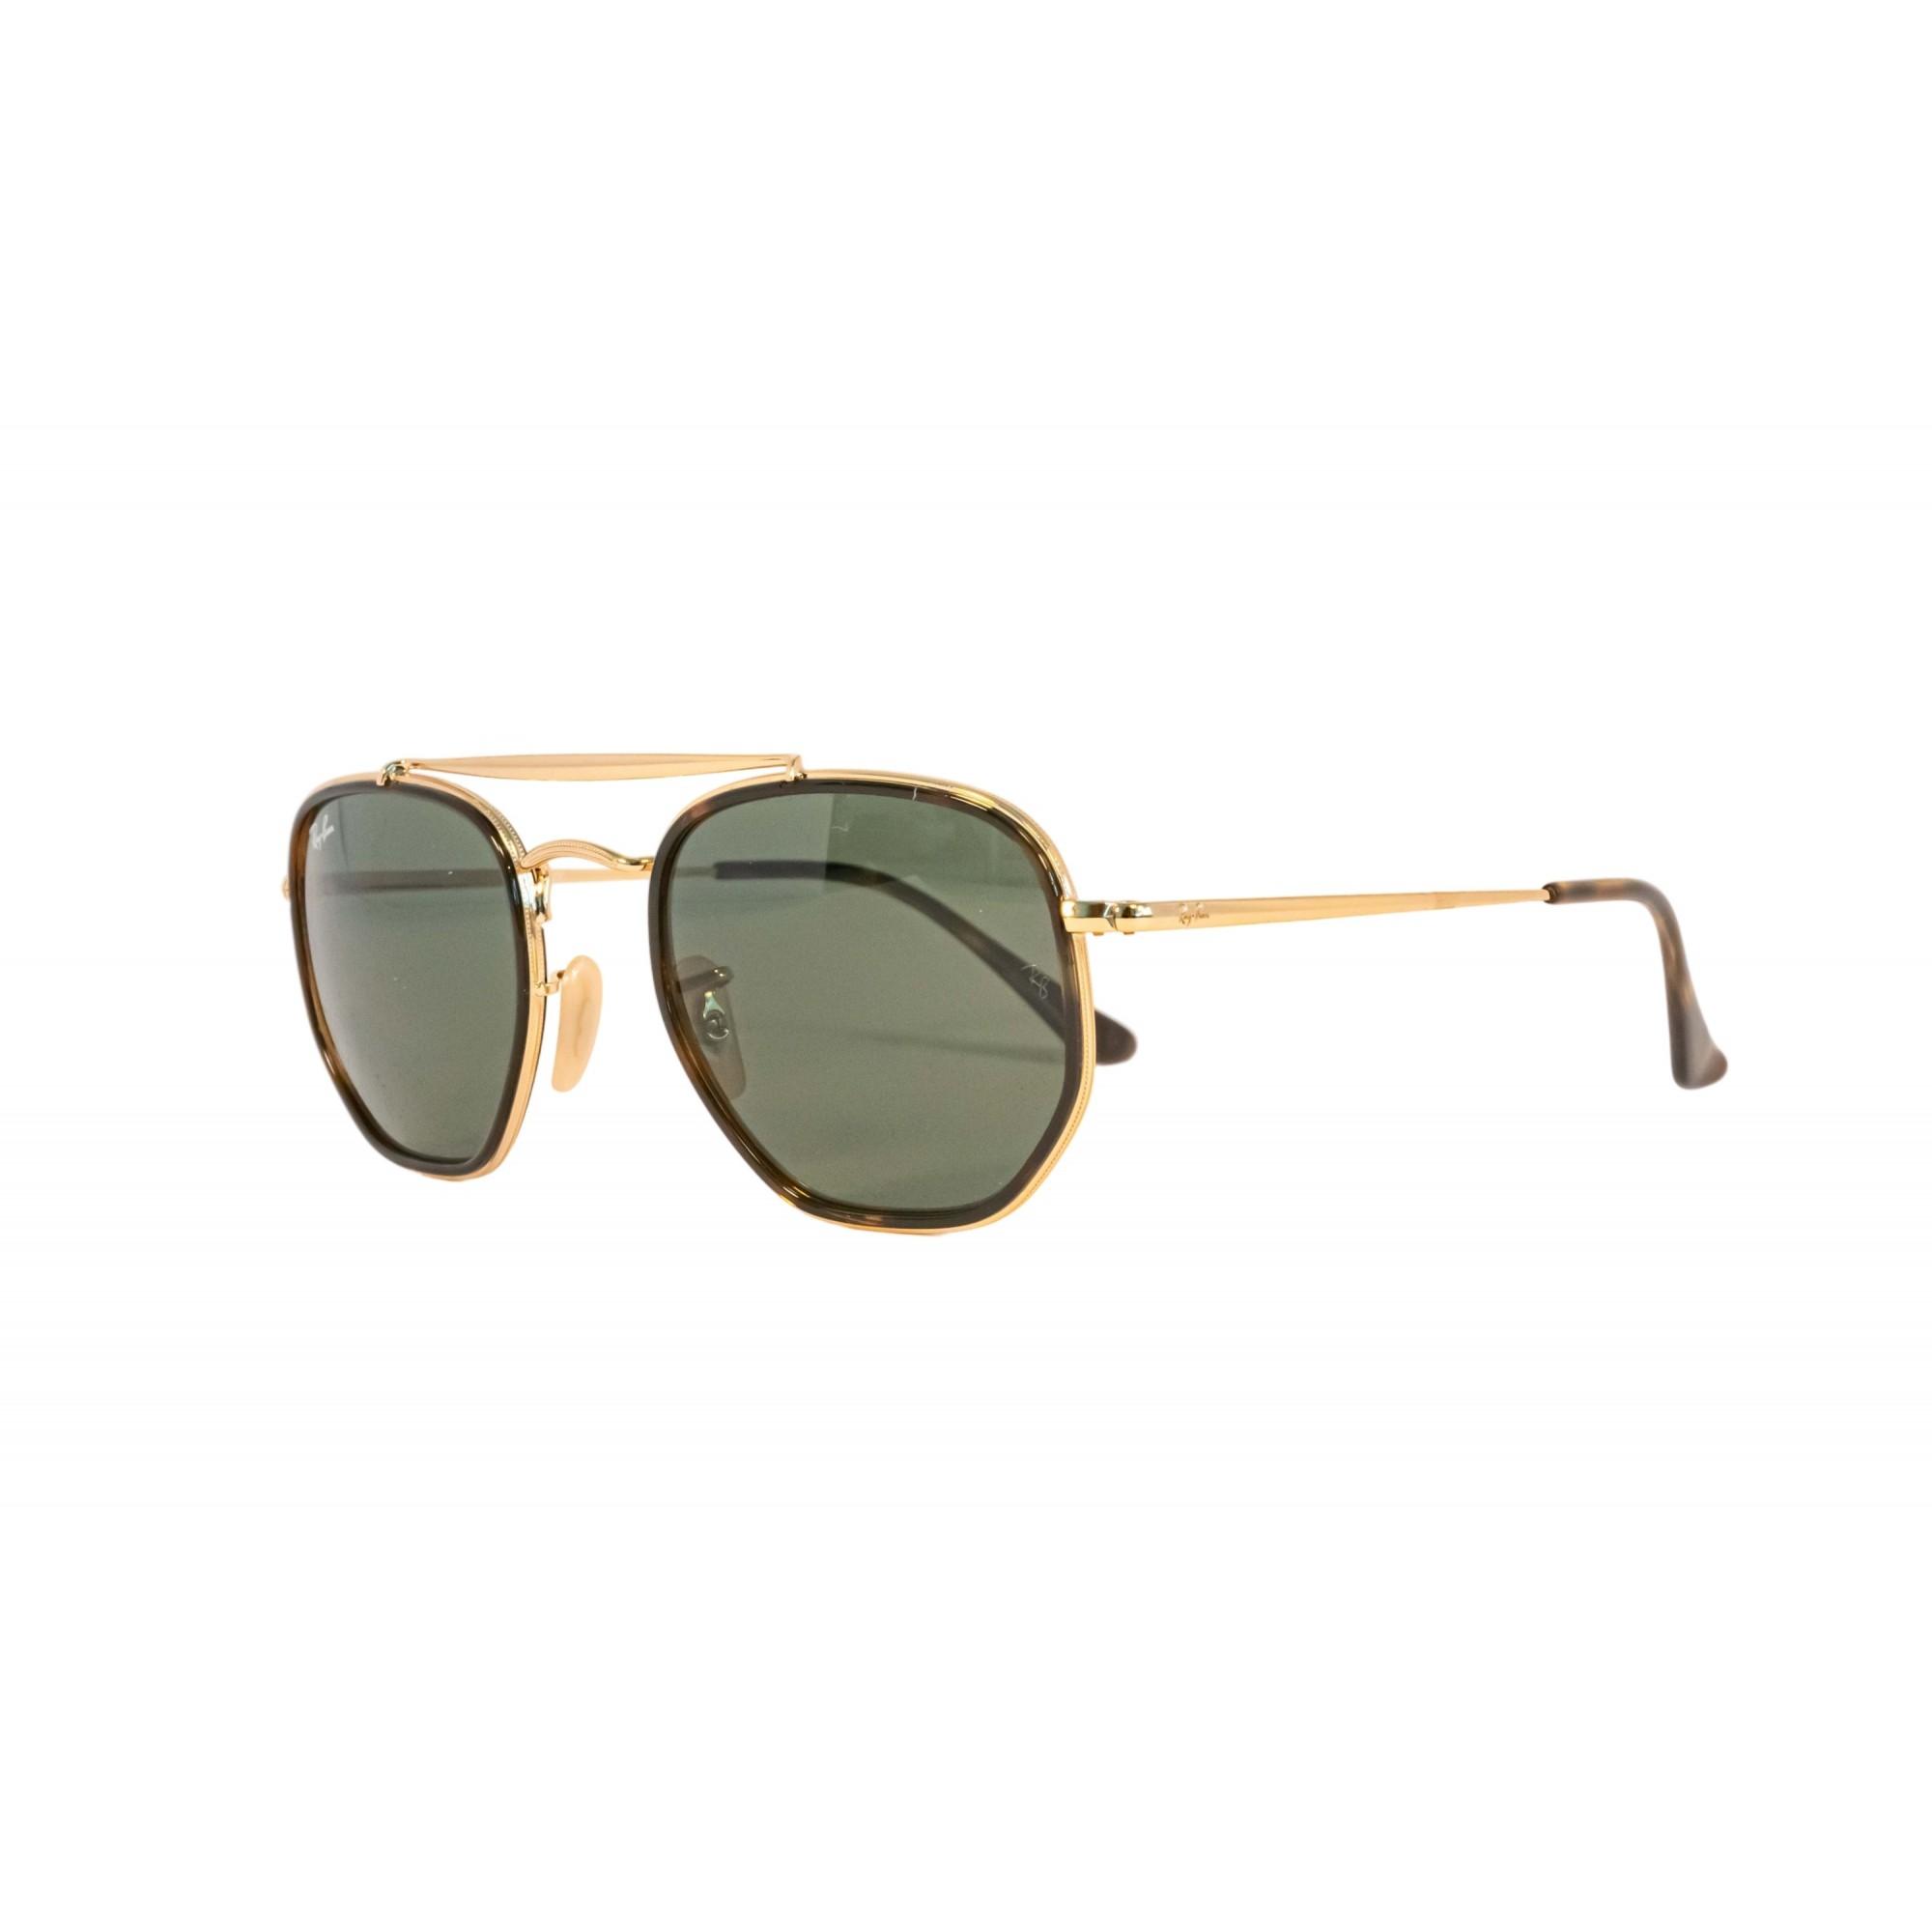 Óculos Ray Ban Marshal Rb3648m 001 52 Dourado